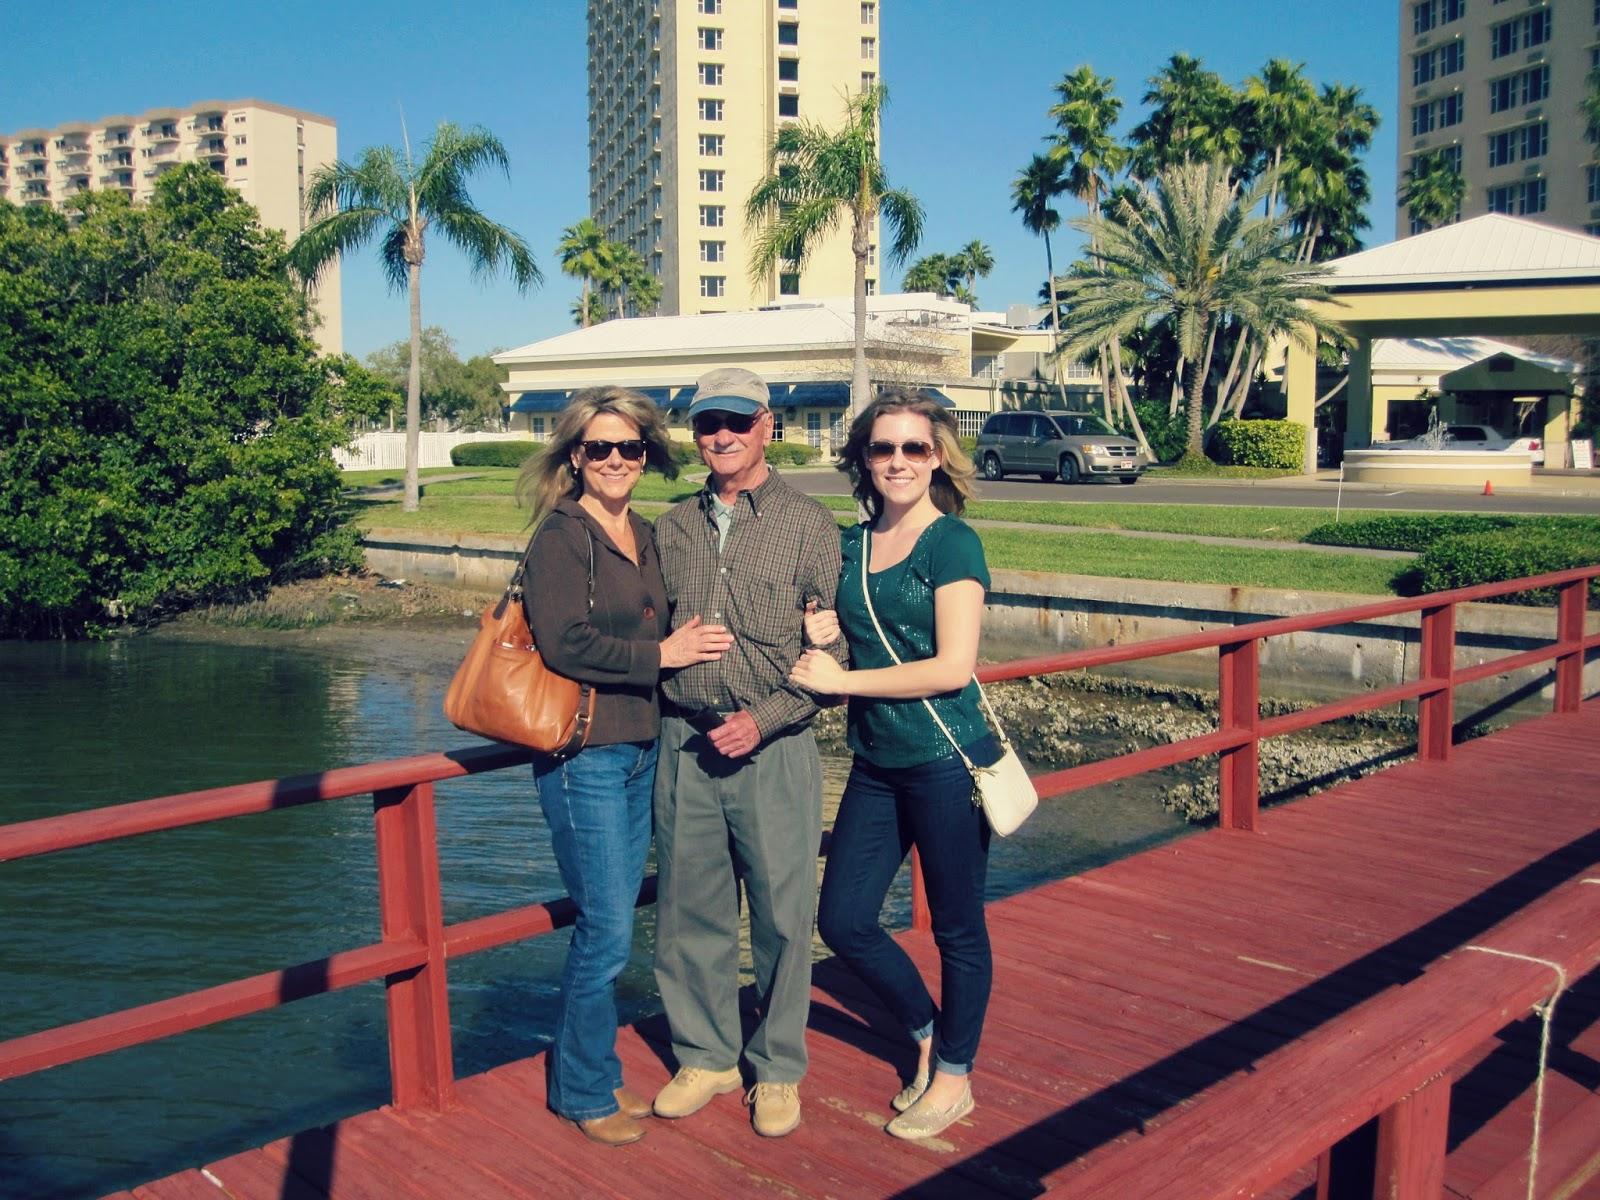 Spring Break In Florida, family photos, florida retirement home